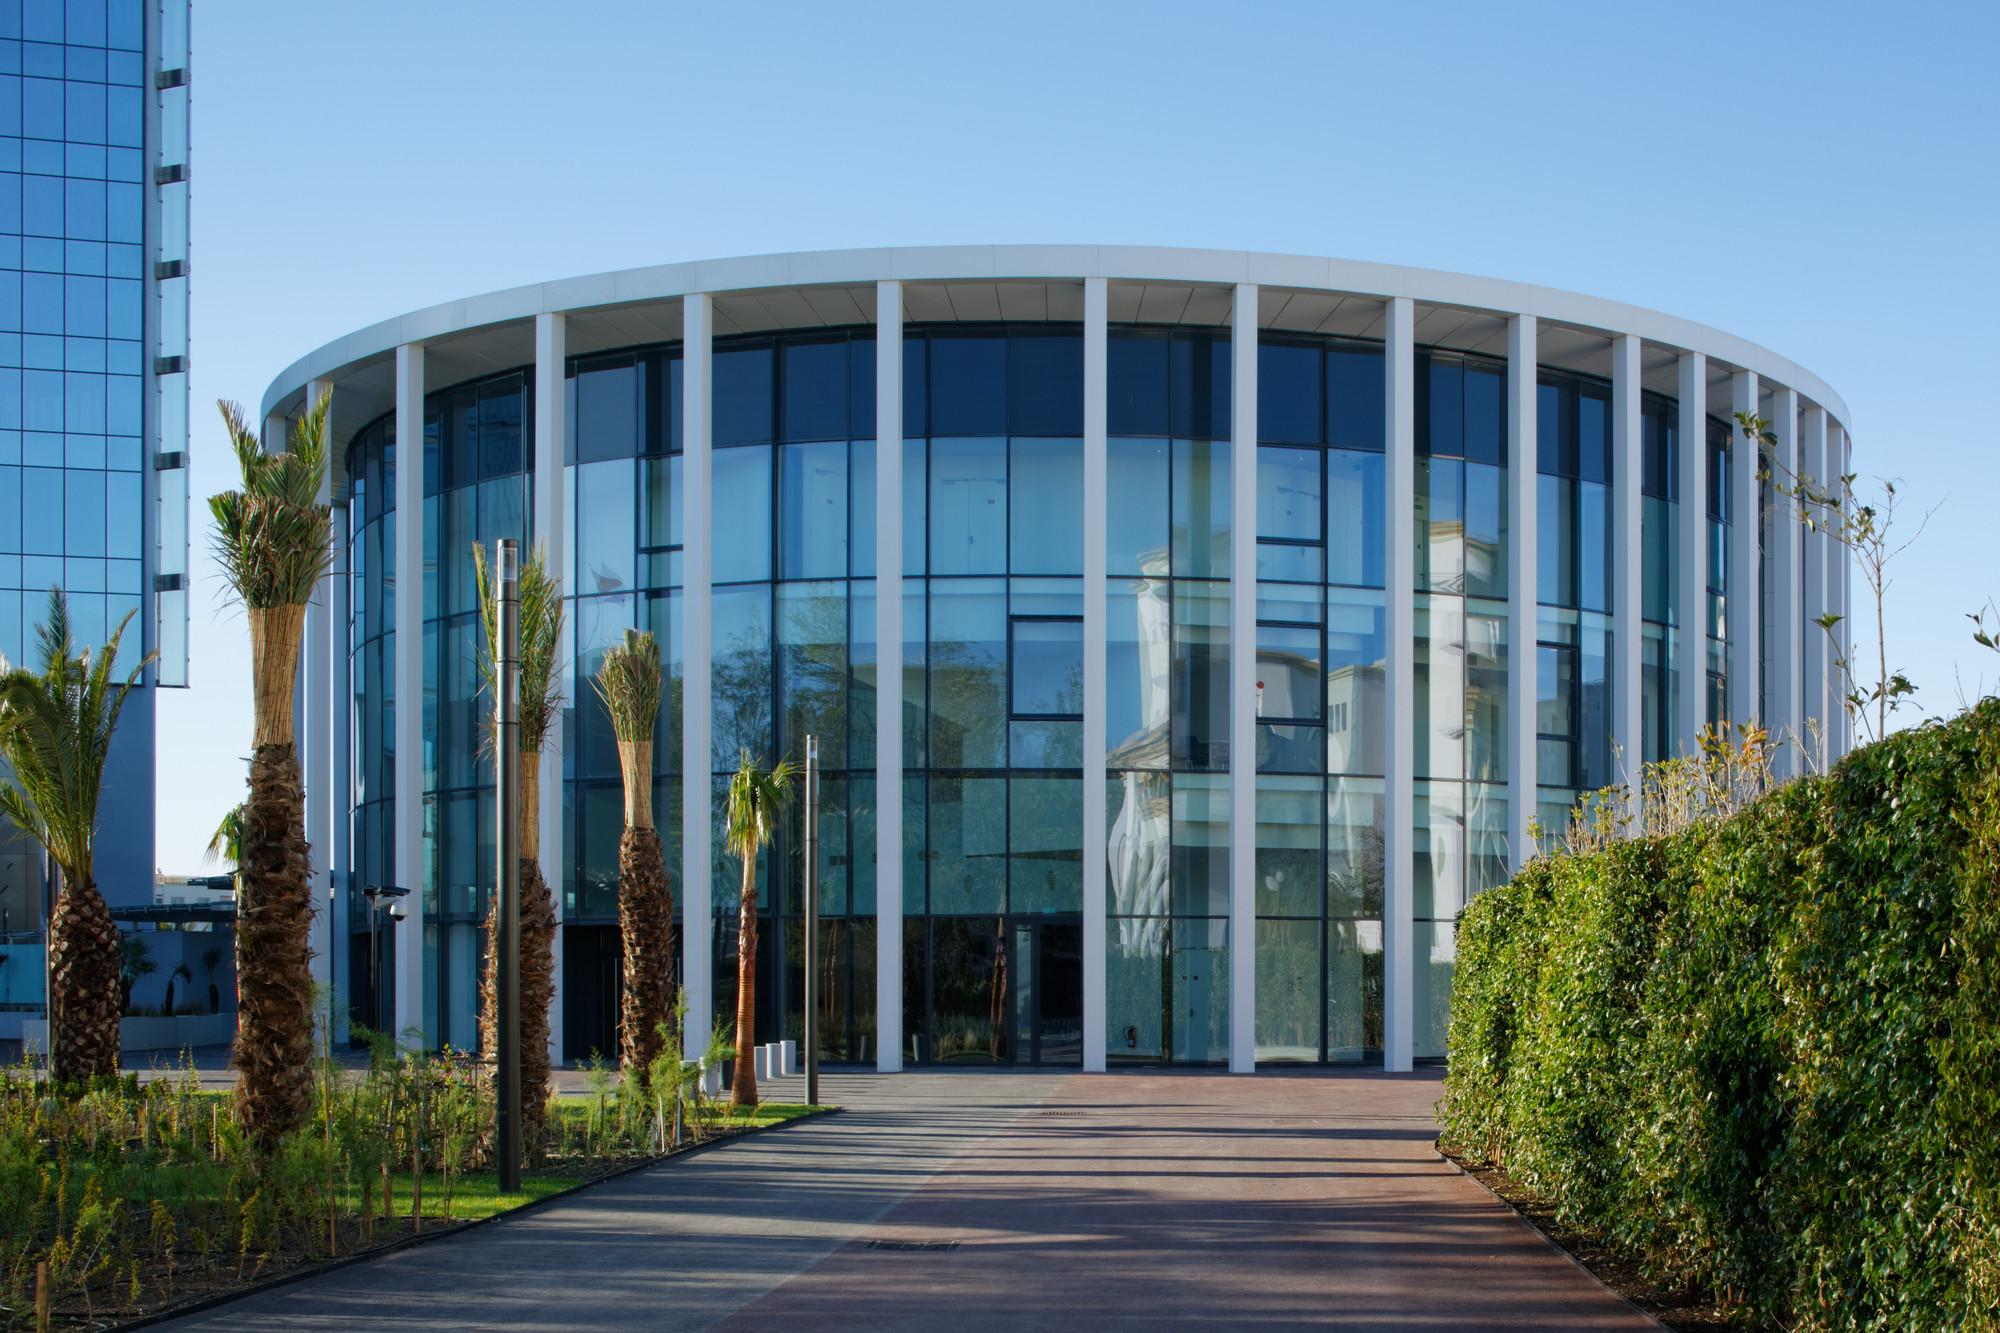 Gallery of maroc telecom jean paul viguier architecture 3 for Architecture marocaine